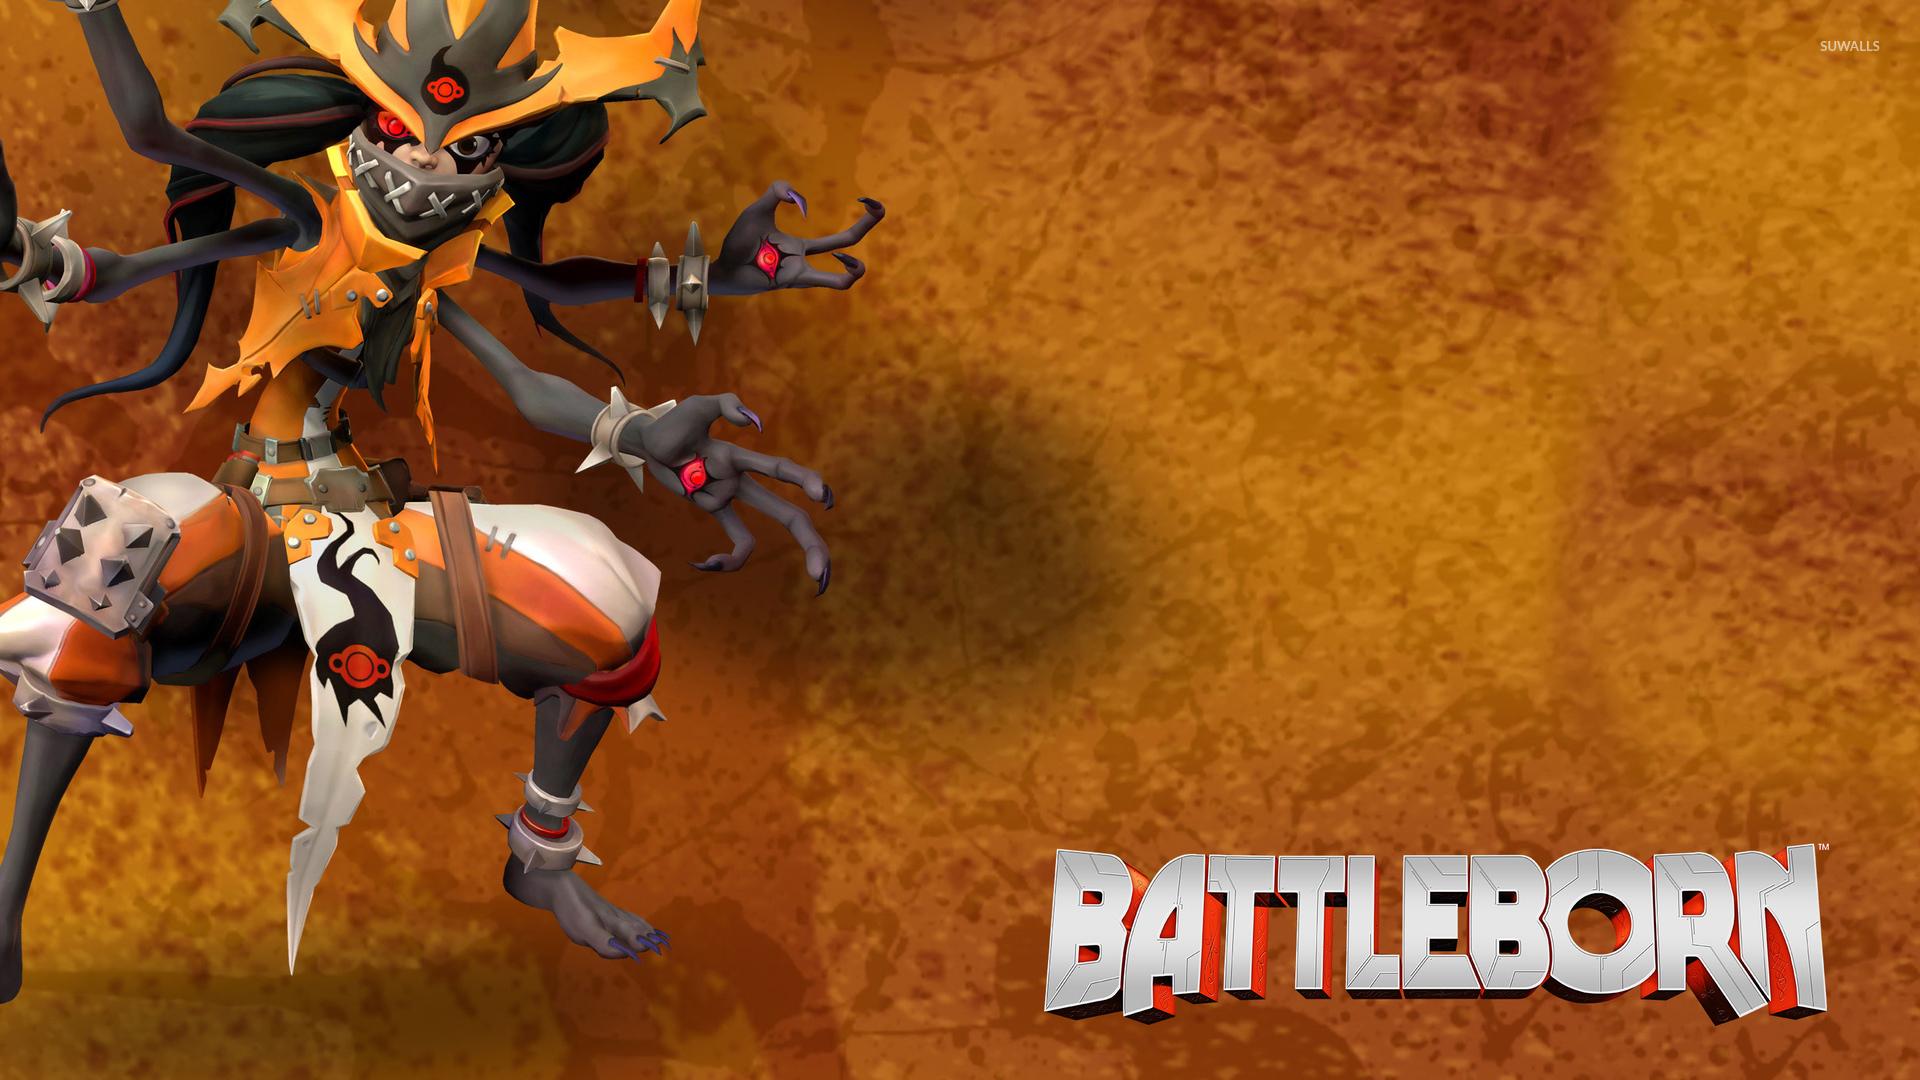 Orendi Battleborn Wallpaper Game Wallpapers 50075